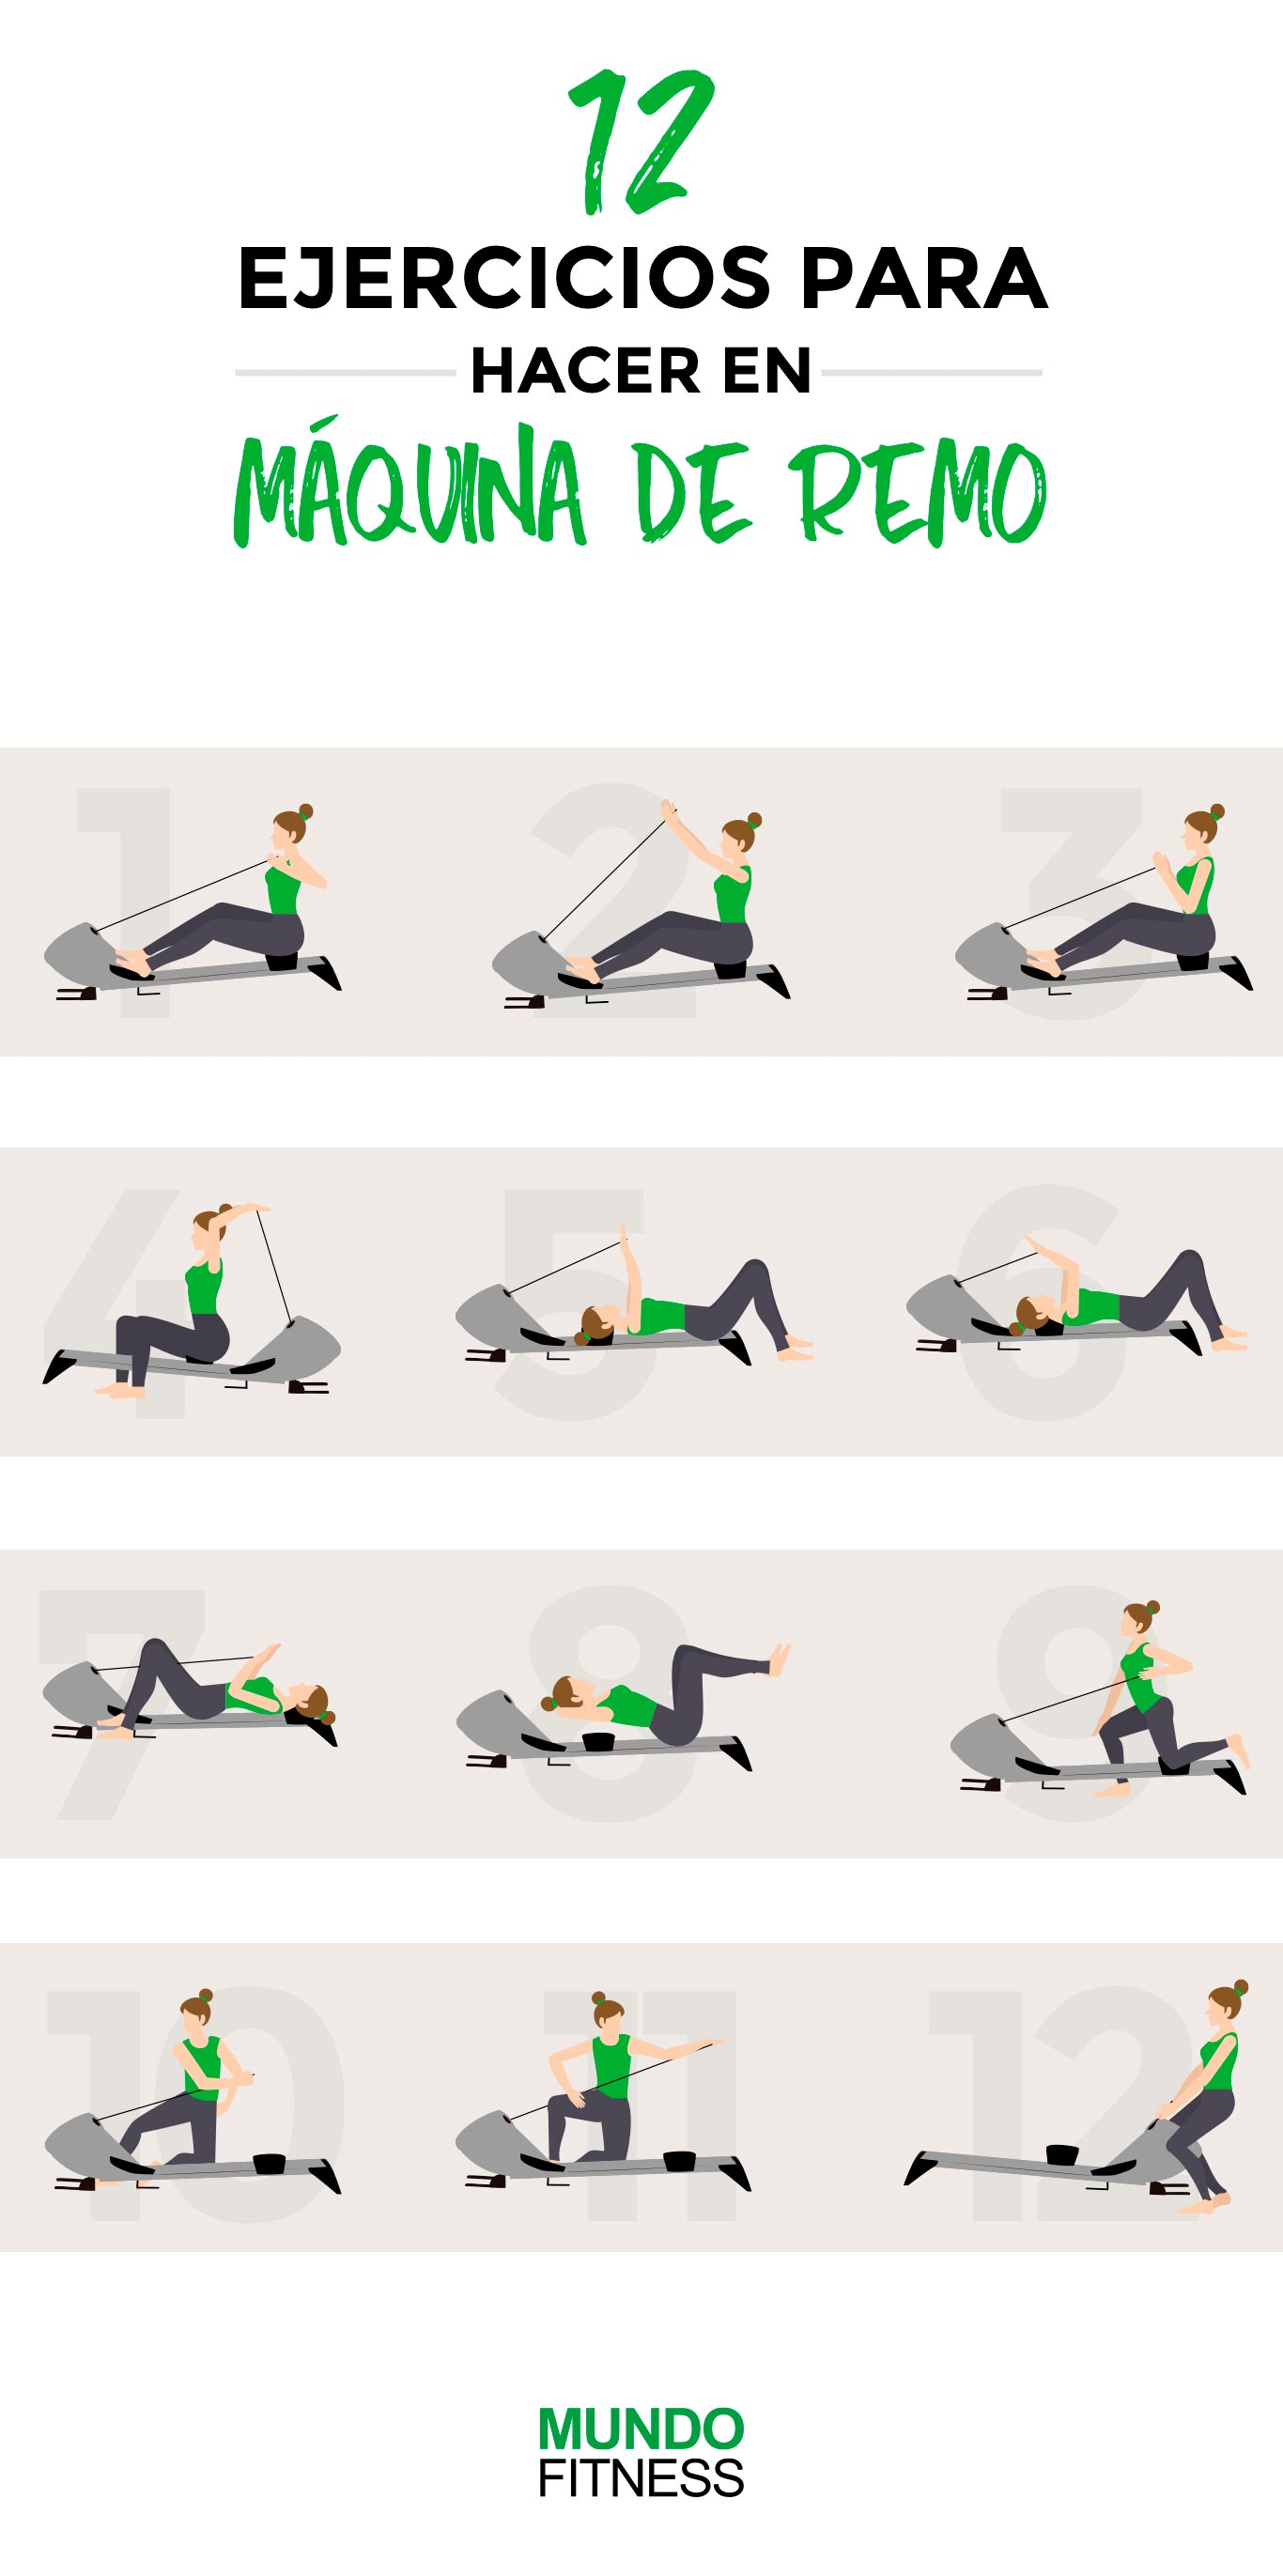 ejercicios-maquina-remo-infografia